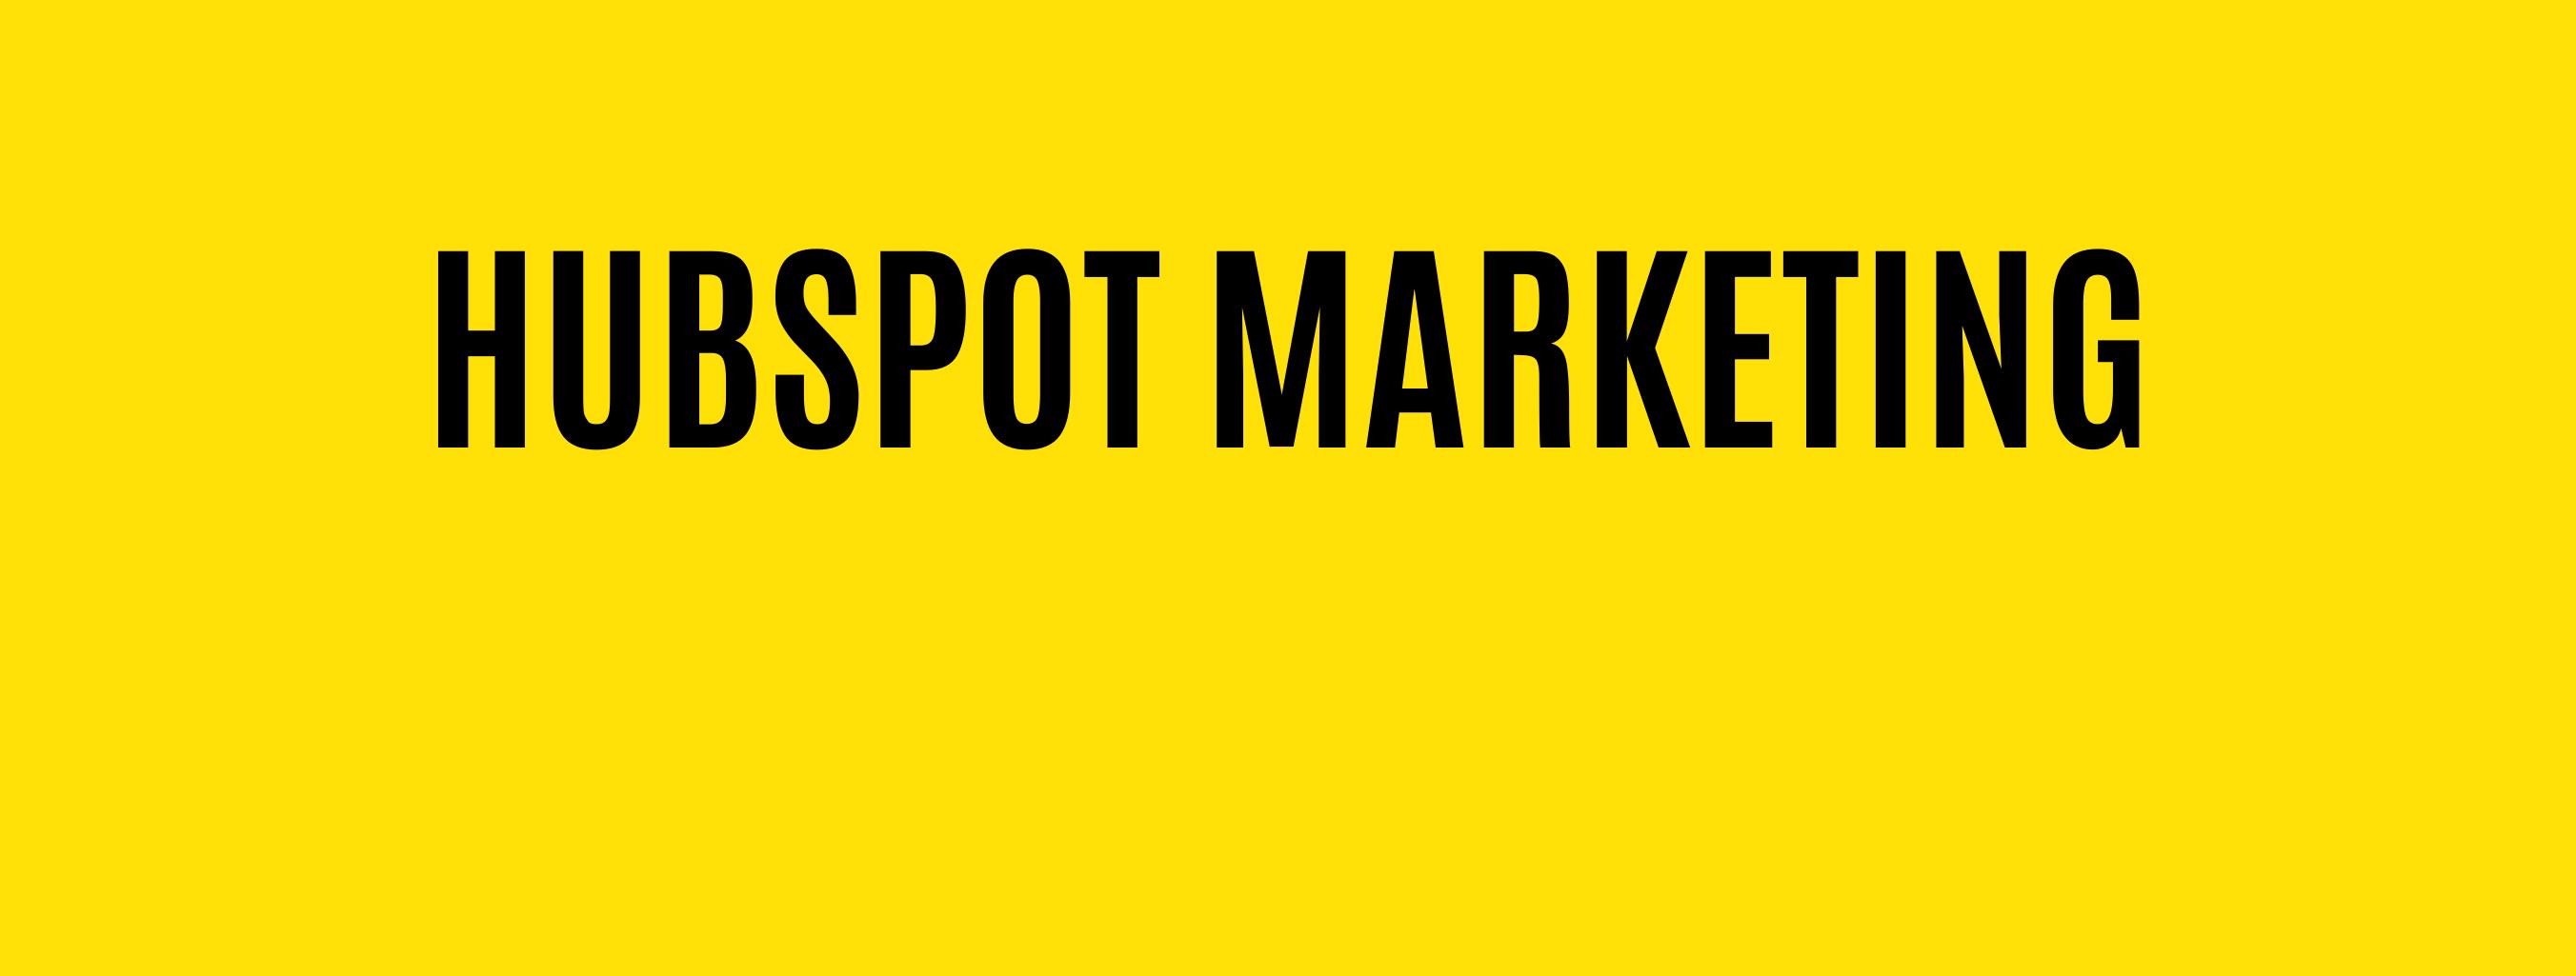 Hire Hubspot Marketing Specialists